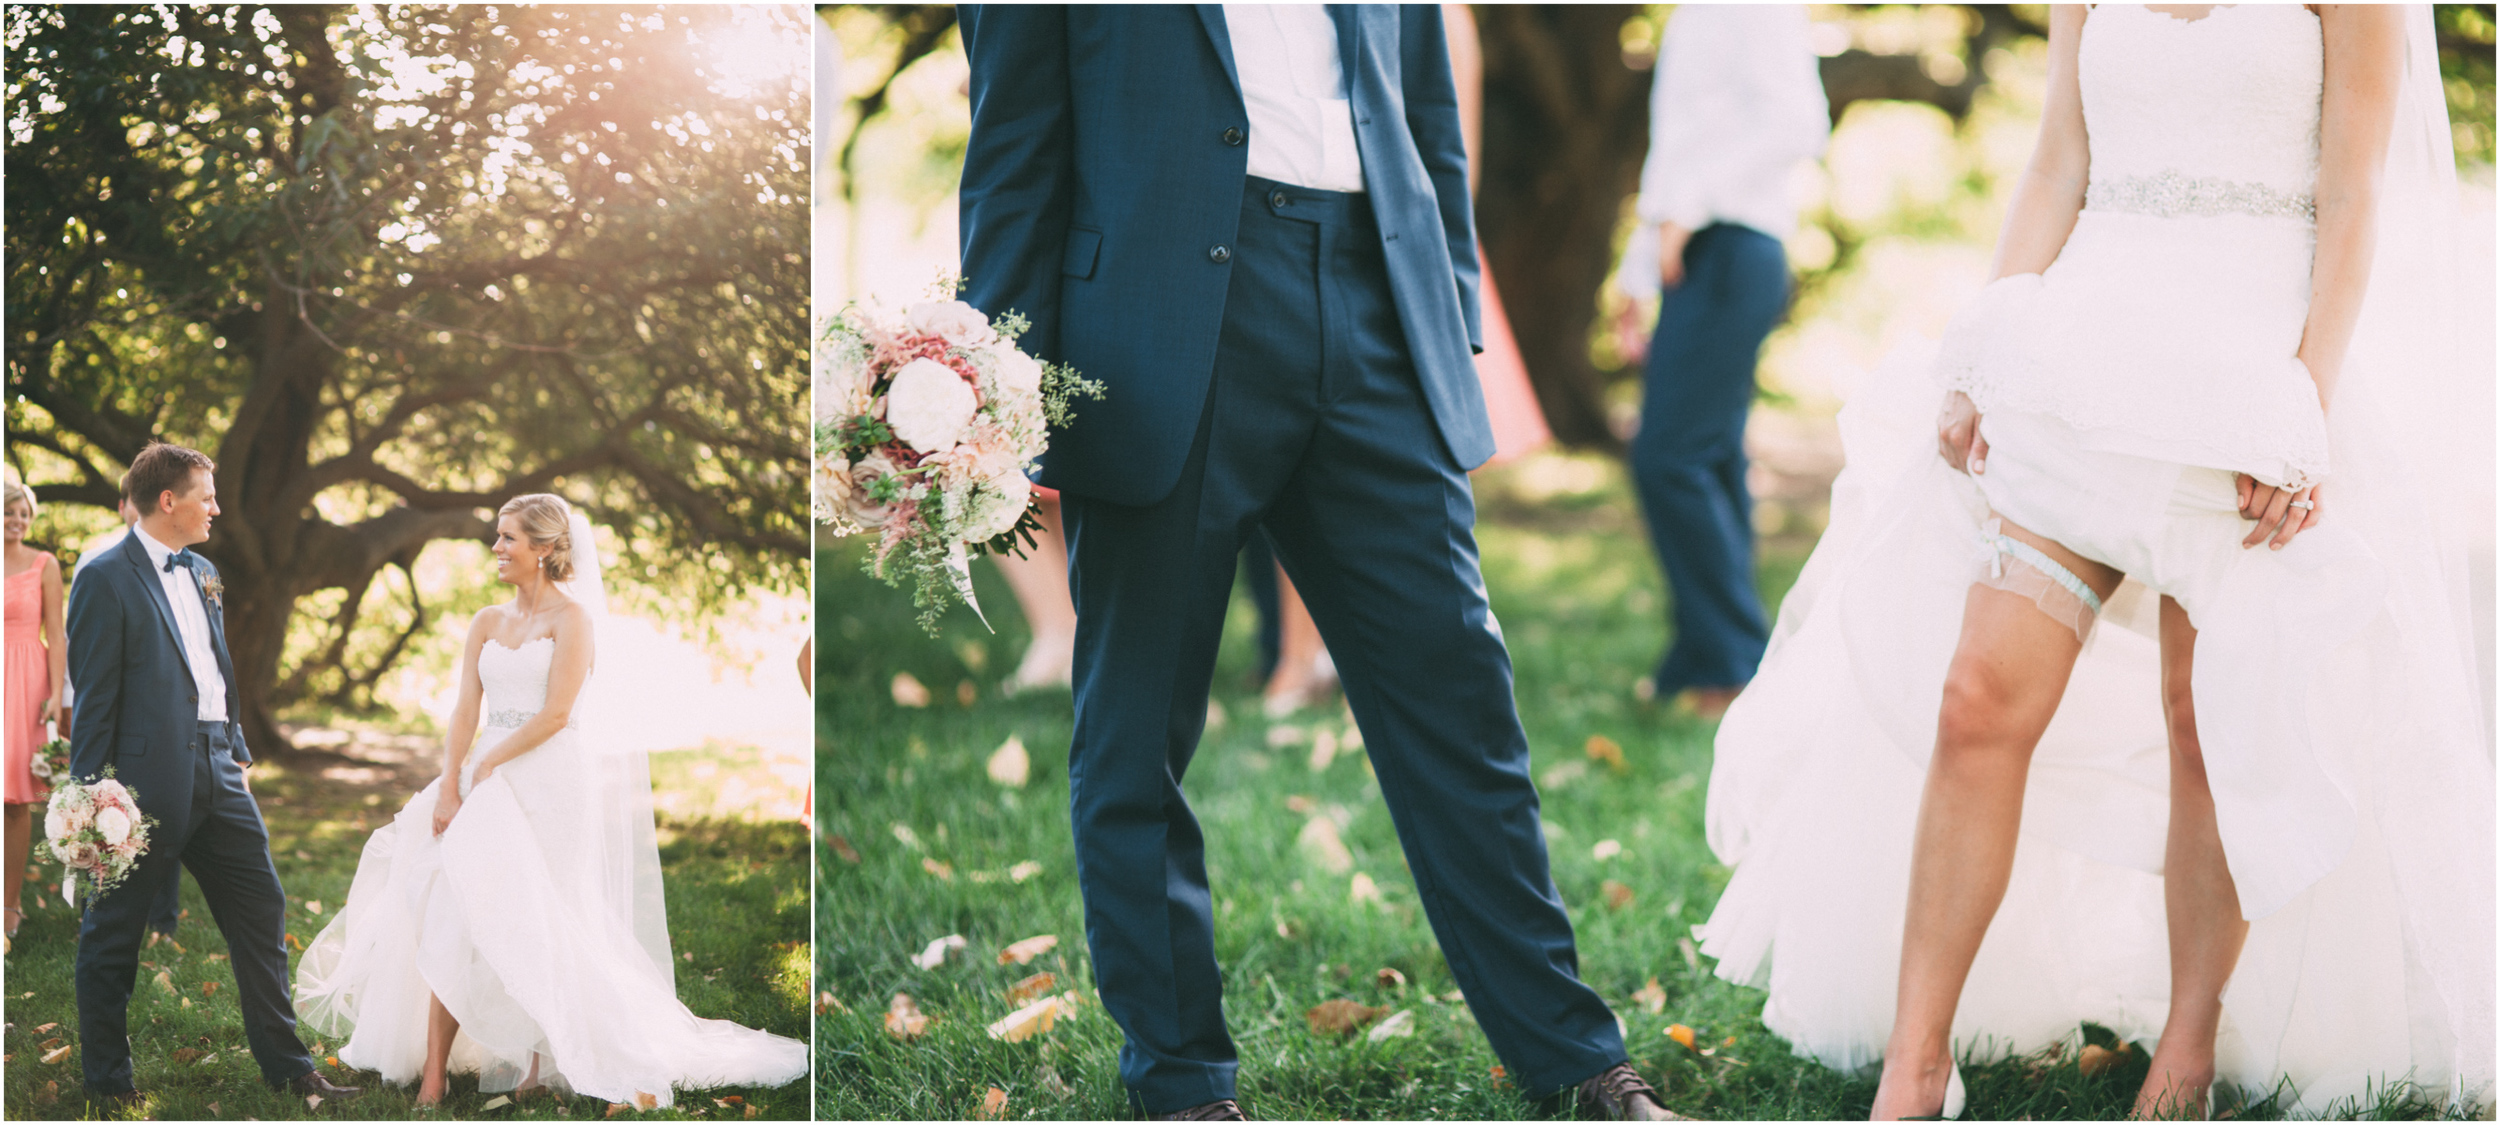 Bride shows groom her garter belt